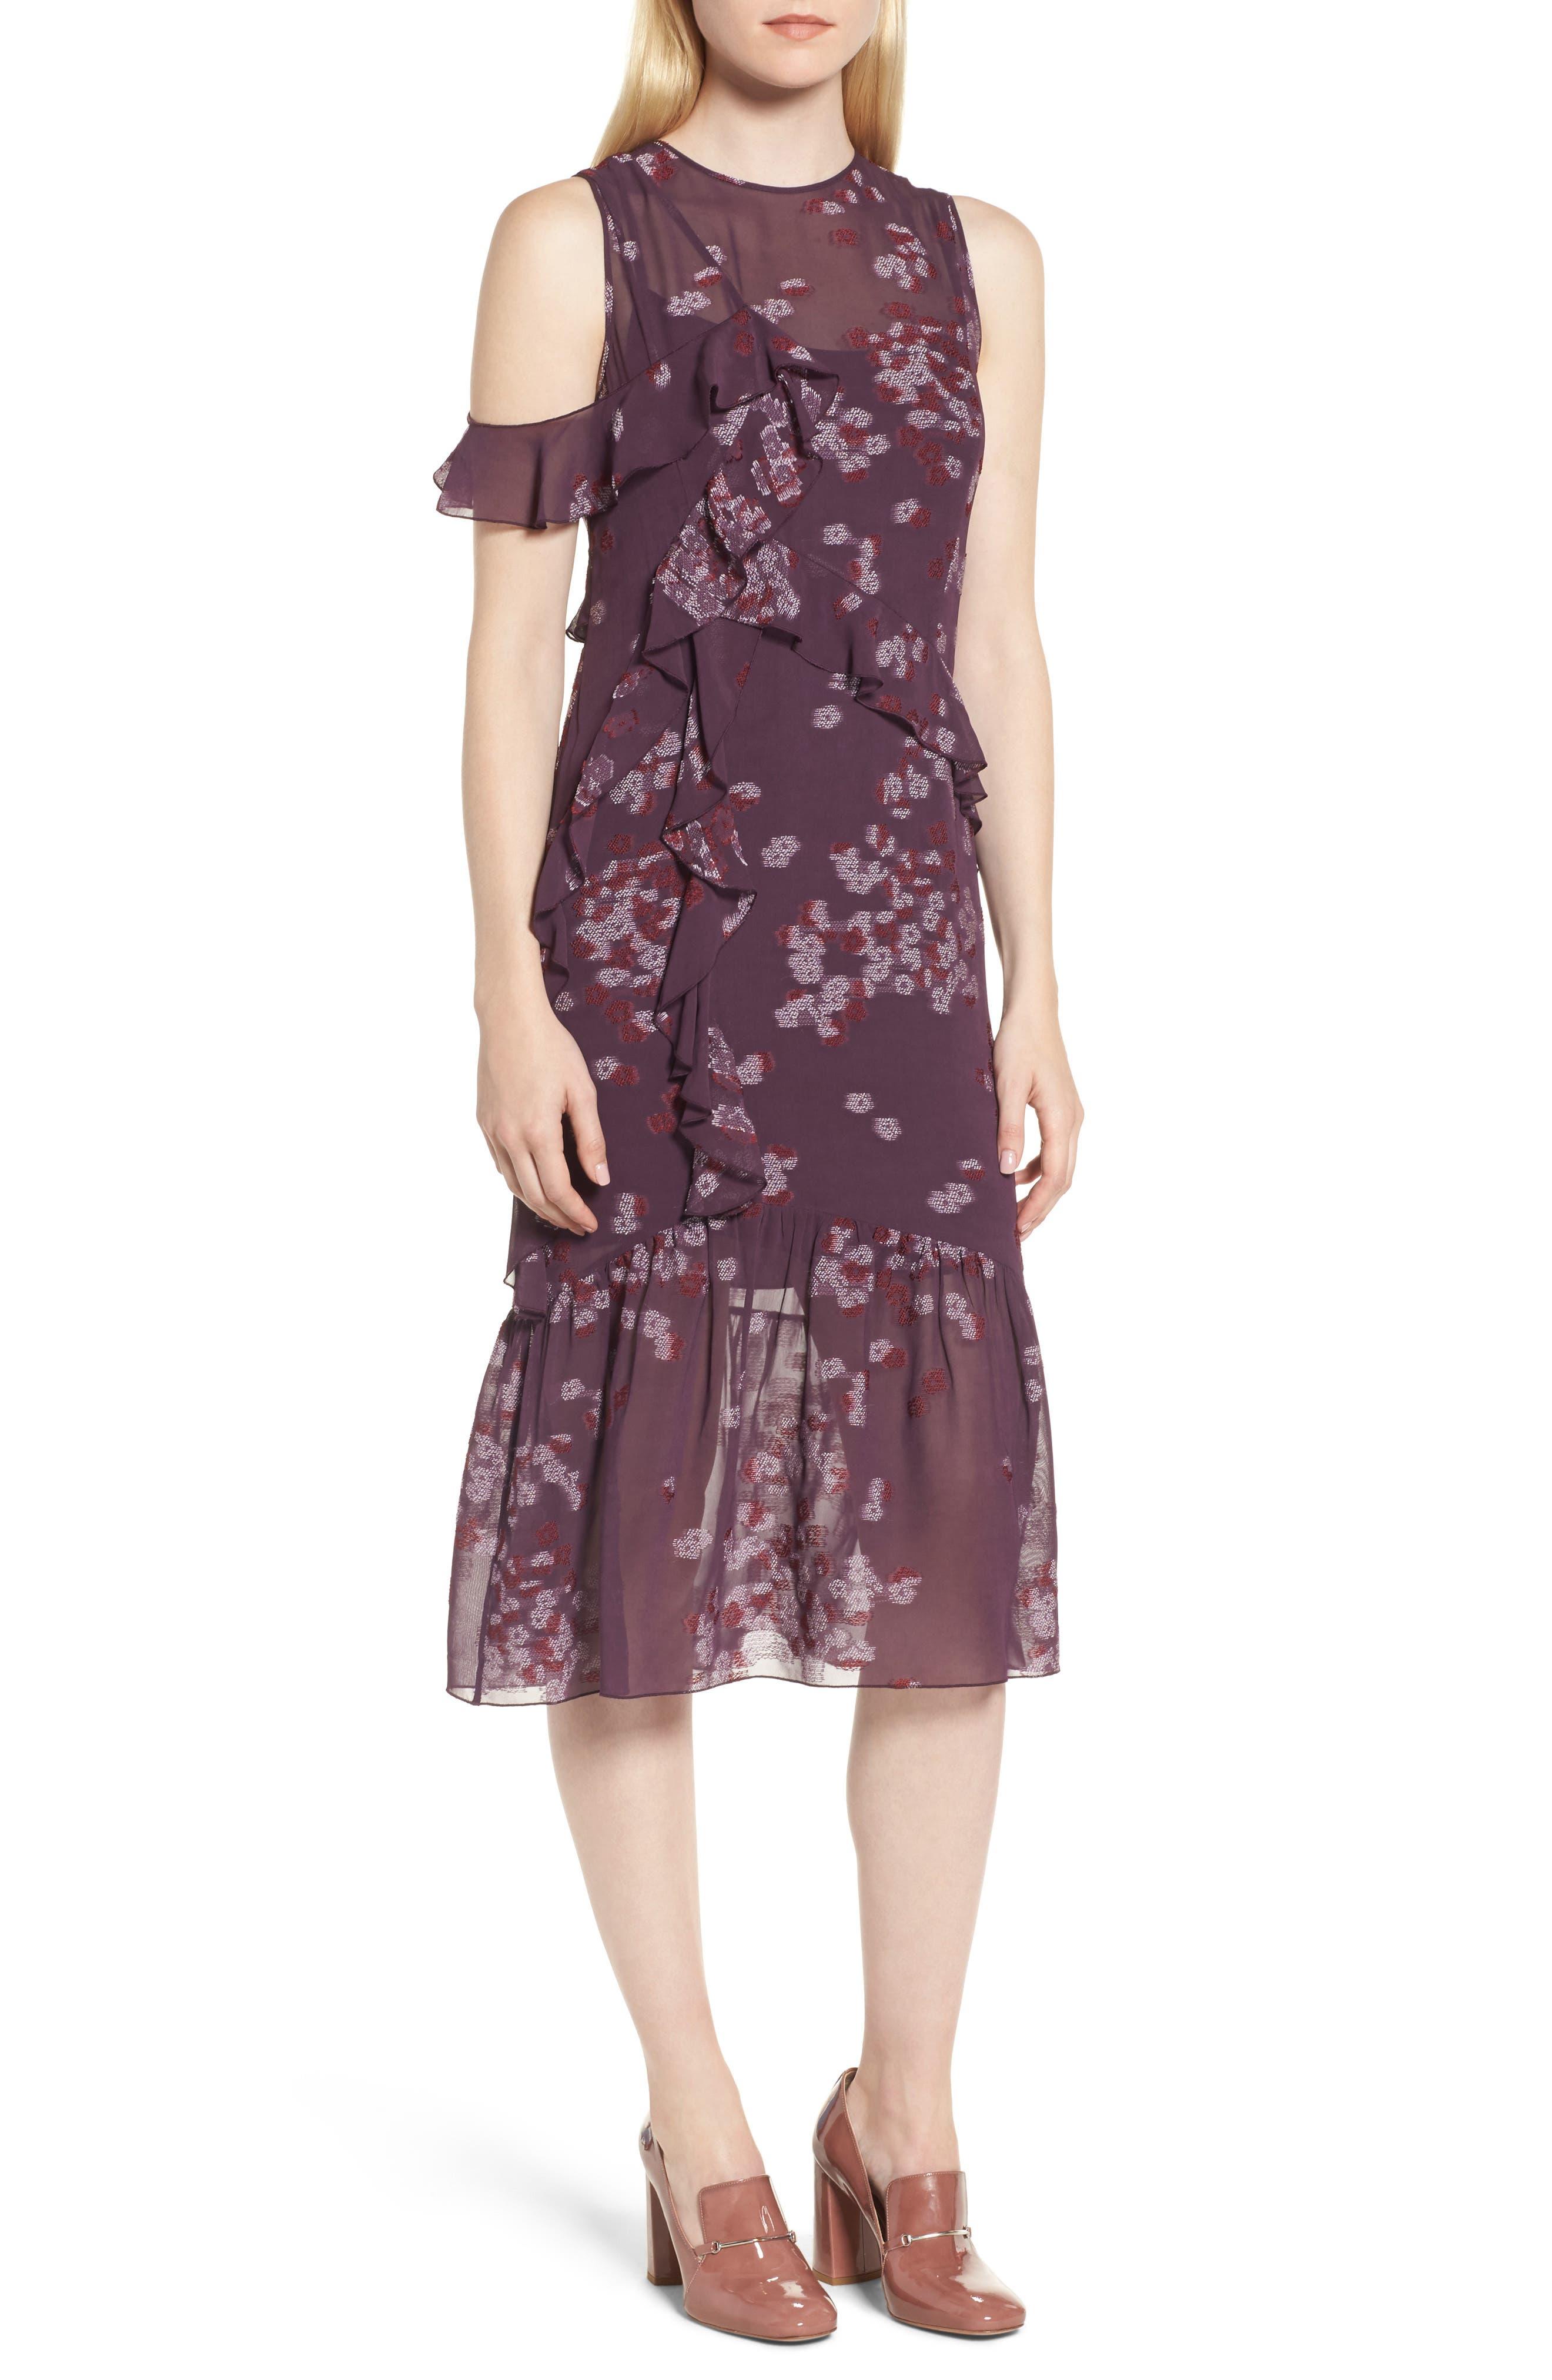 Jacquard Ruffle Dress,                             Main thumbnail 1, color,                             Purple Plum Scattered Floral